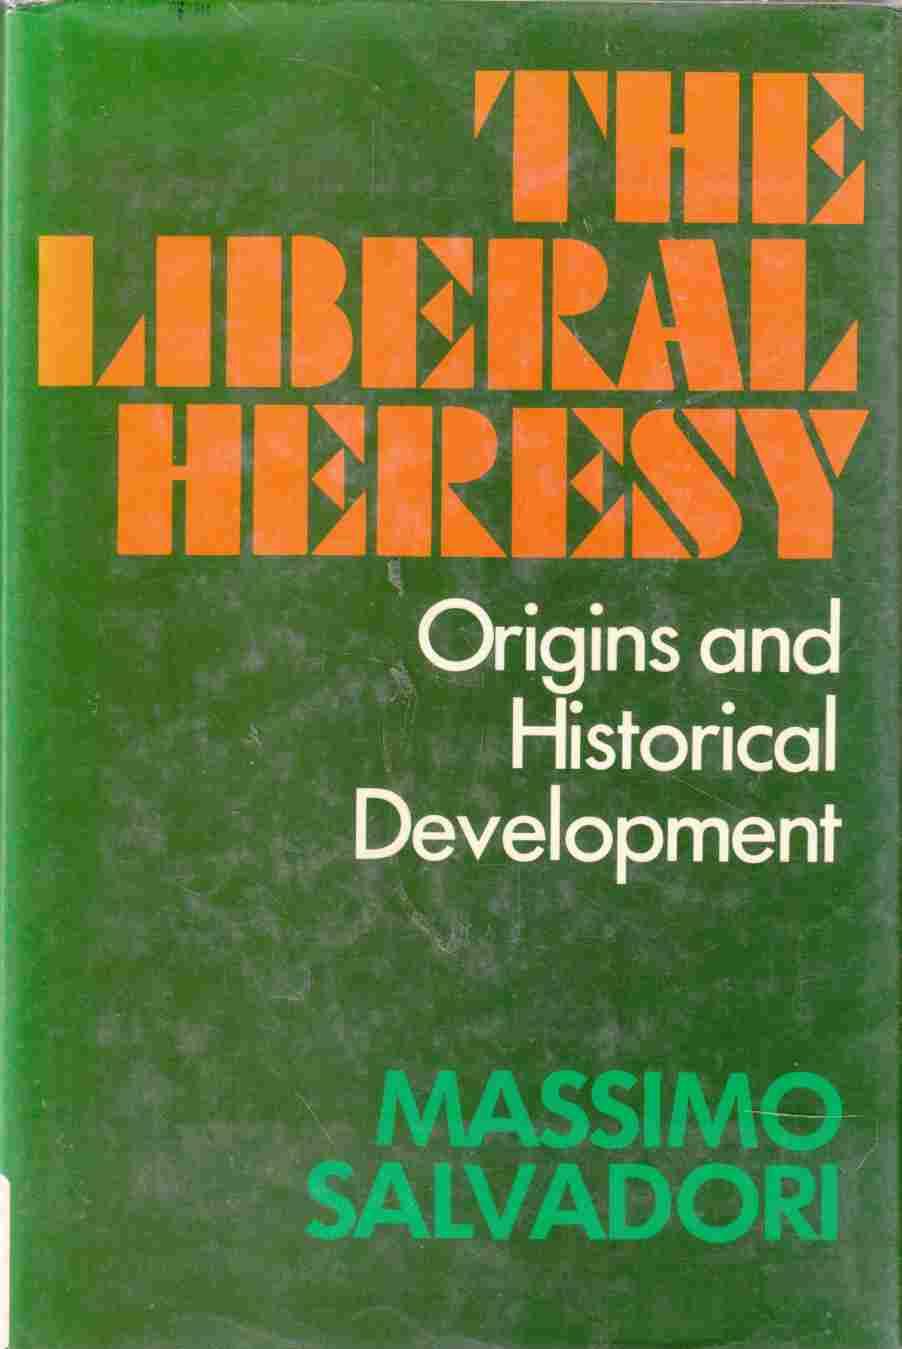 Erezia liberala